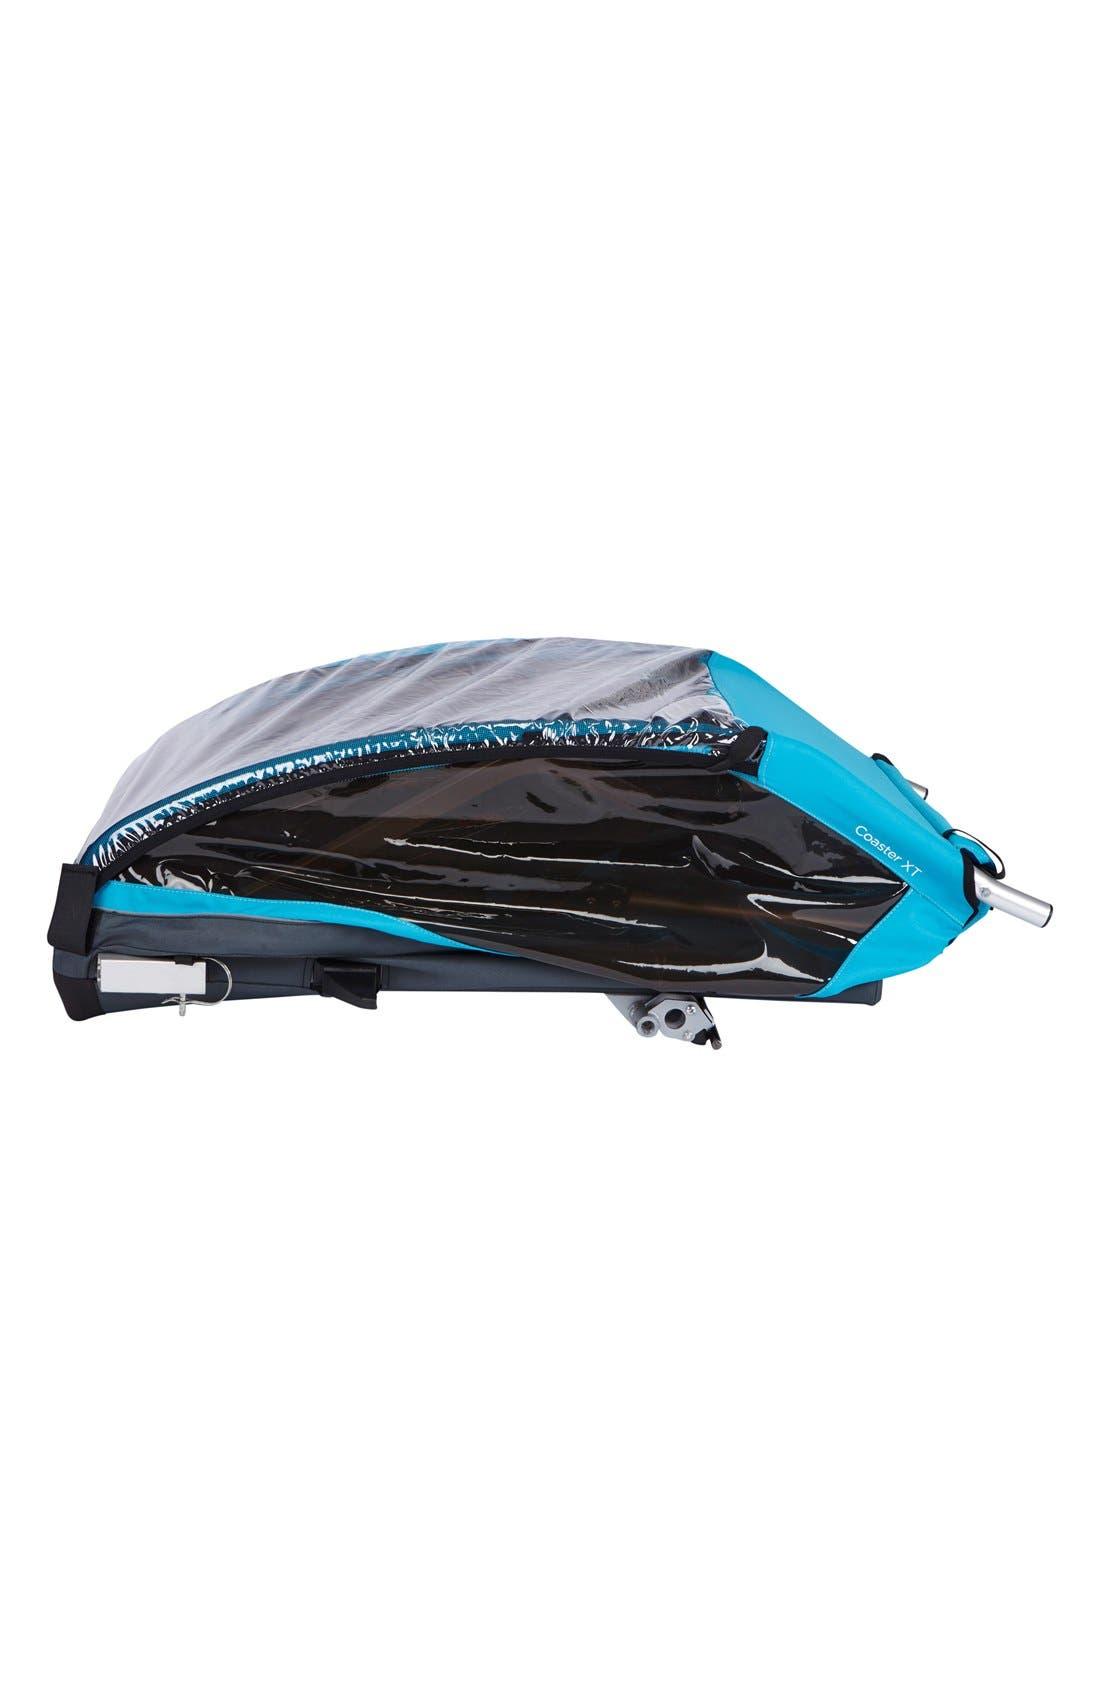 Coaster XT Double Seat Bike Trailer,                             Alternate thumbnail 5, color,                             BLUE